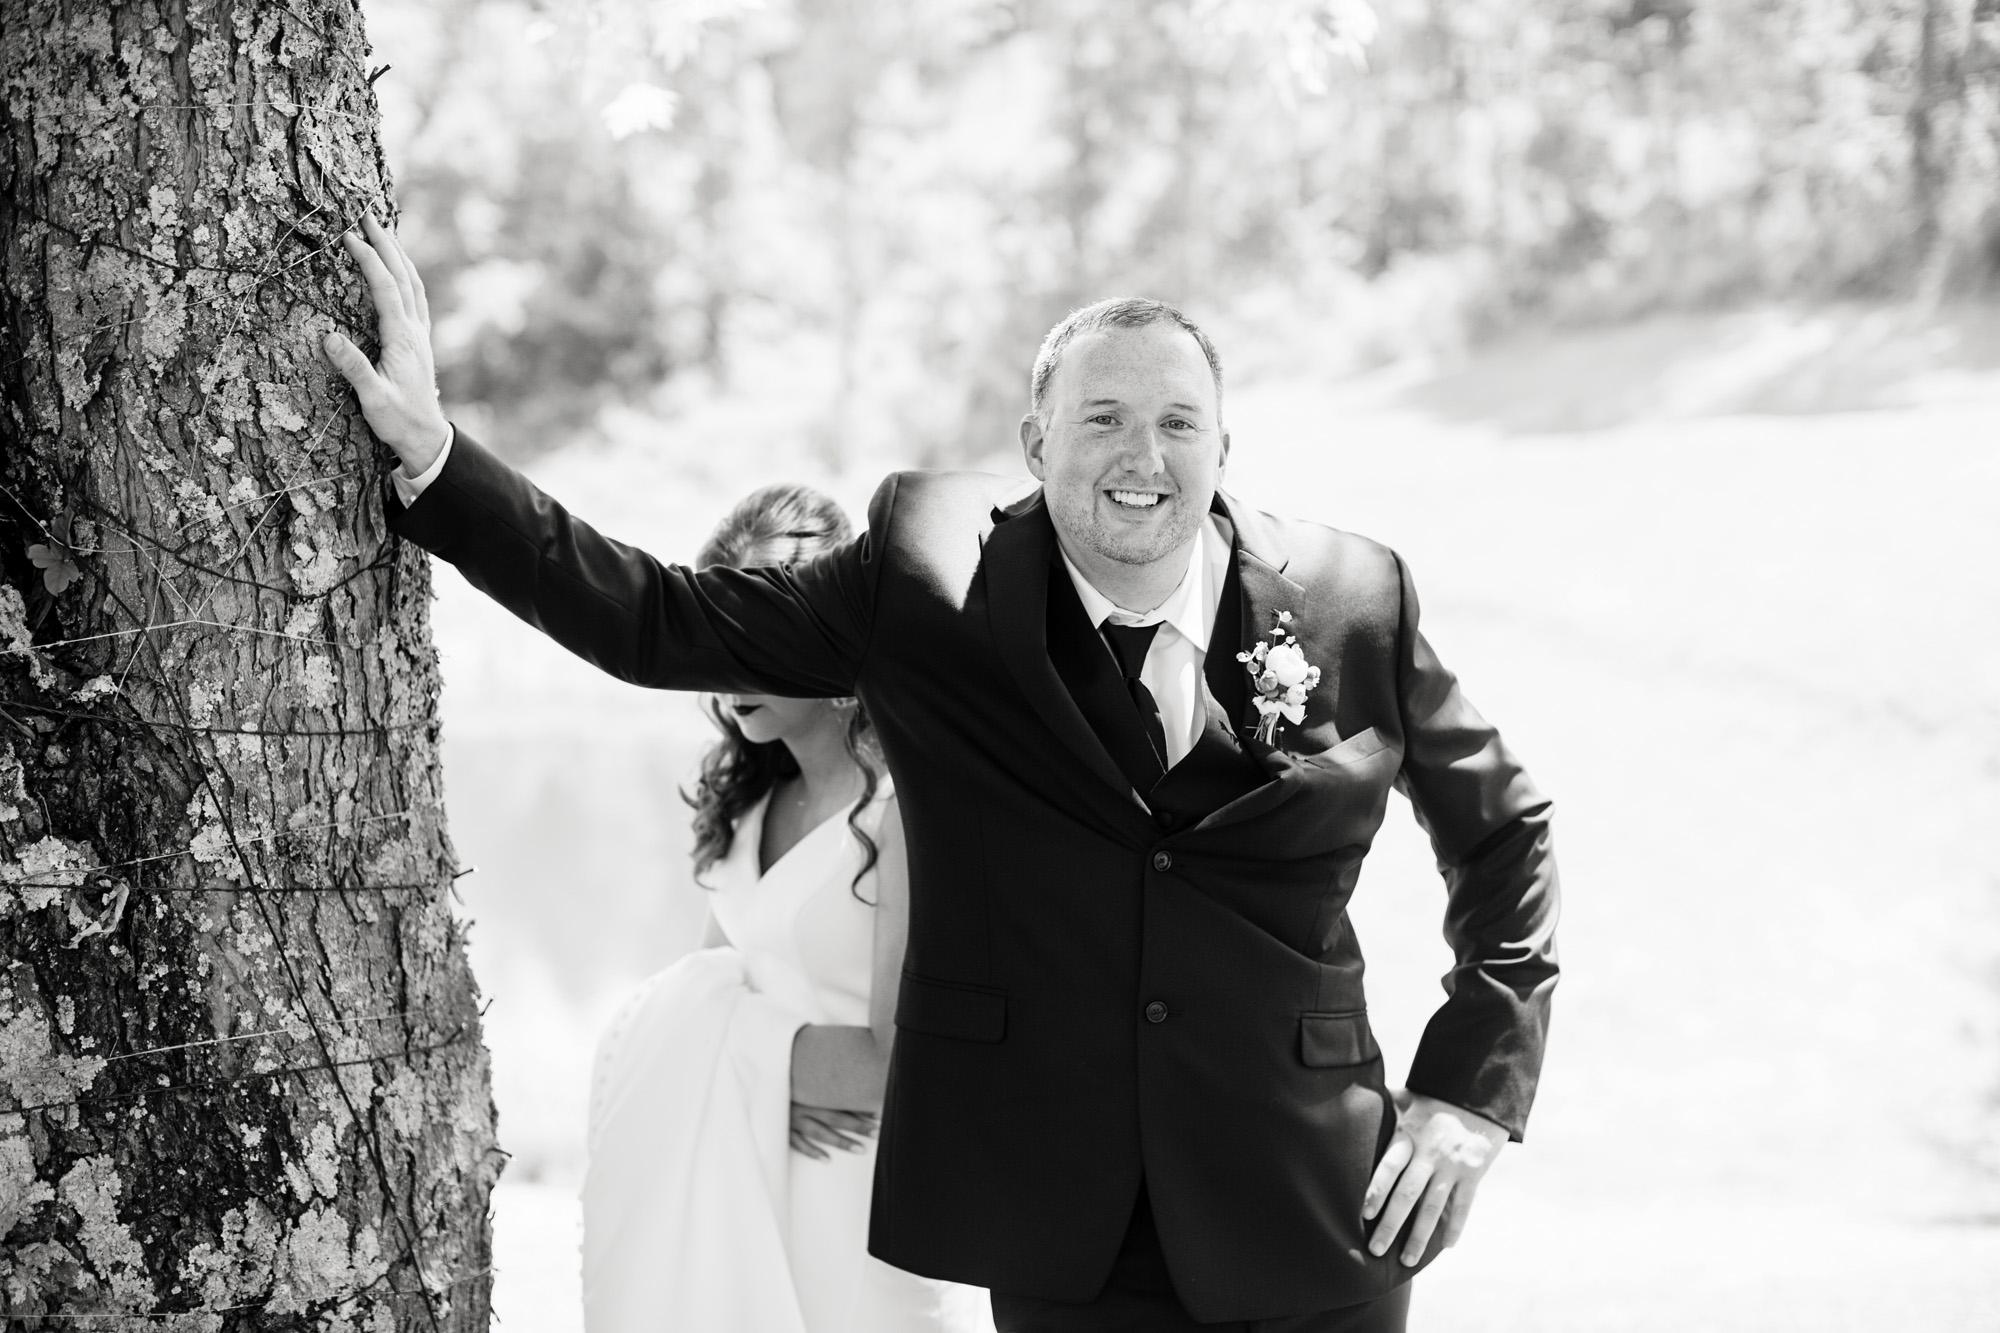 Seriously_Sabrina_Photography_Red_River_Gorge_Wedding_Barn_Robinson34.jpg